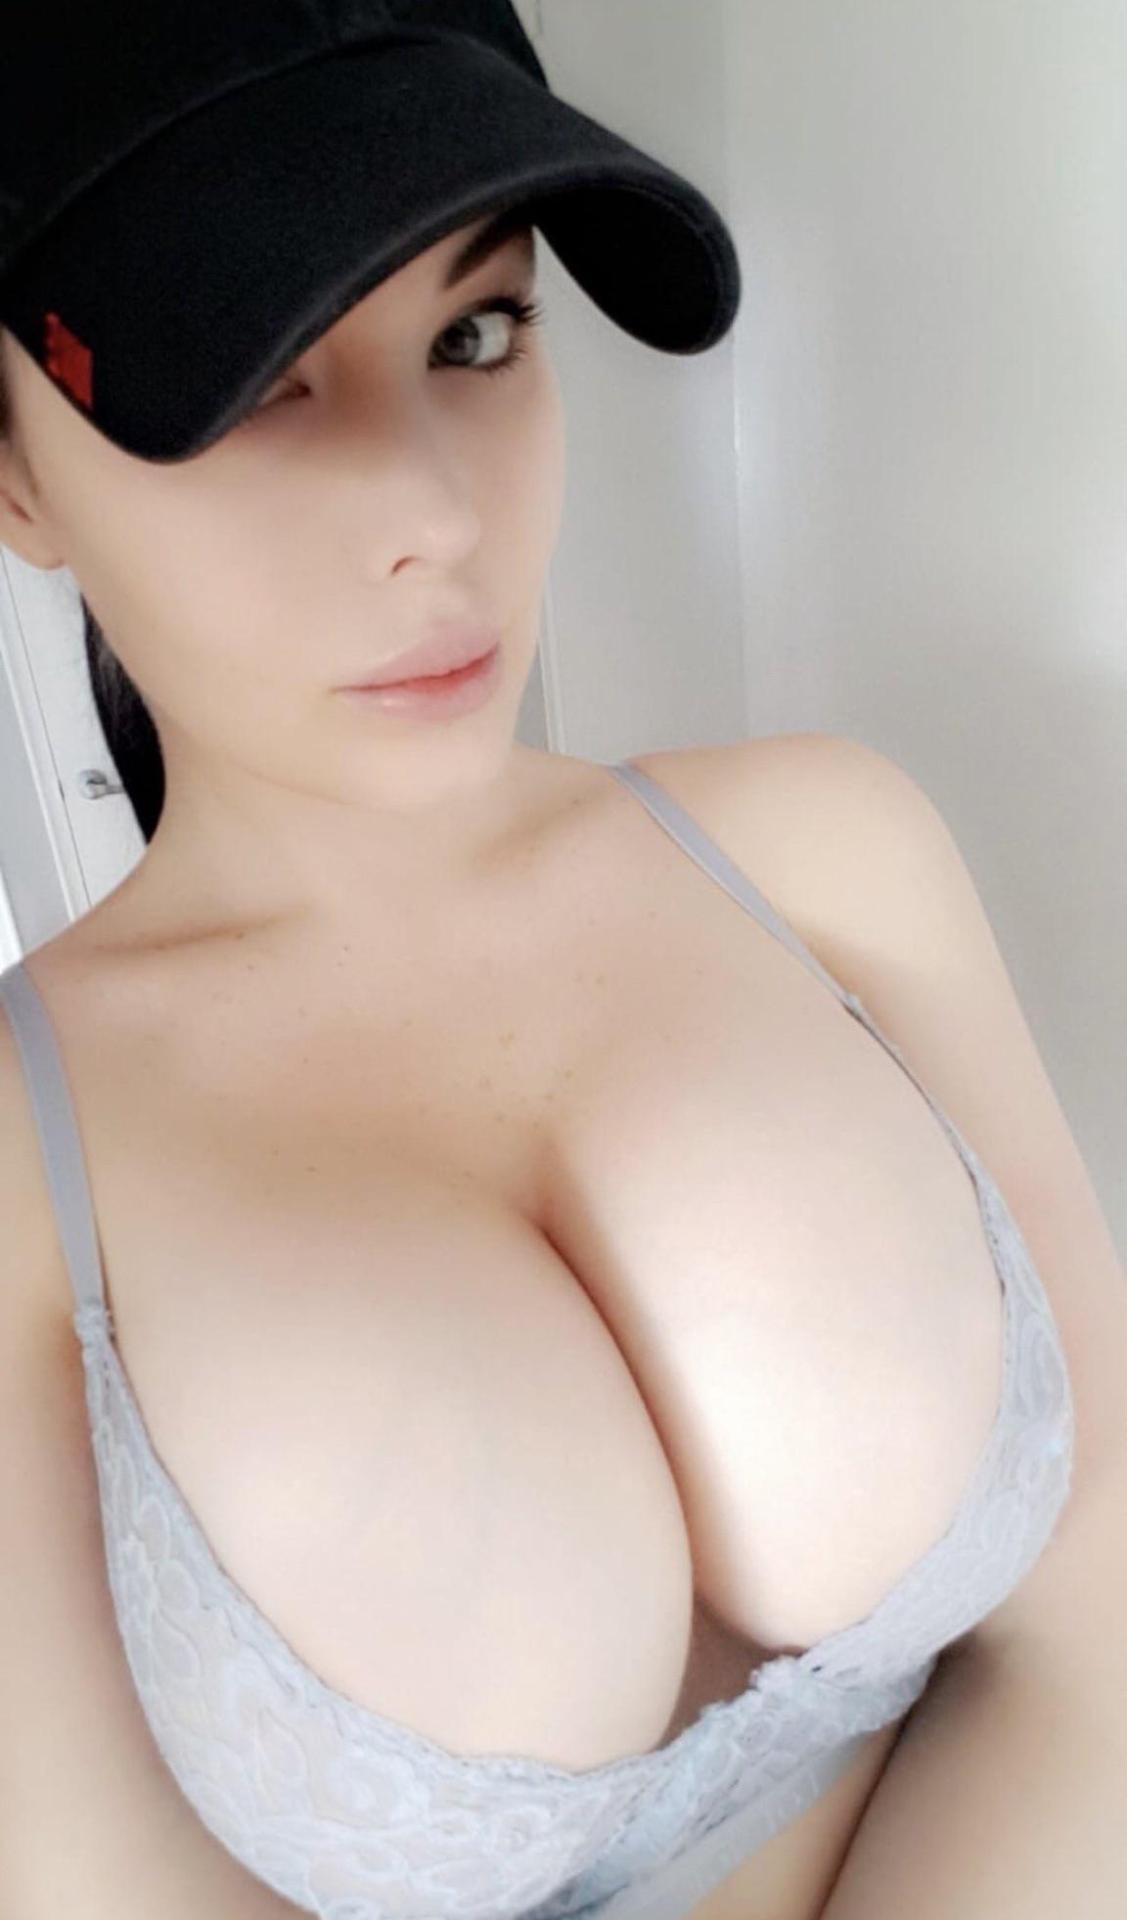 tchat sexe live anal